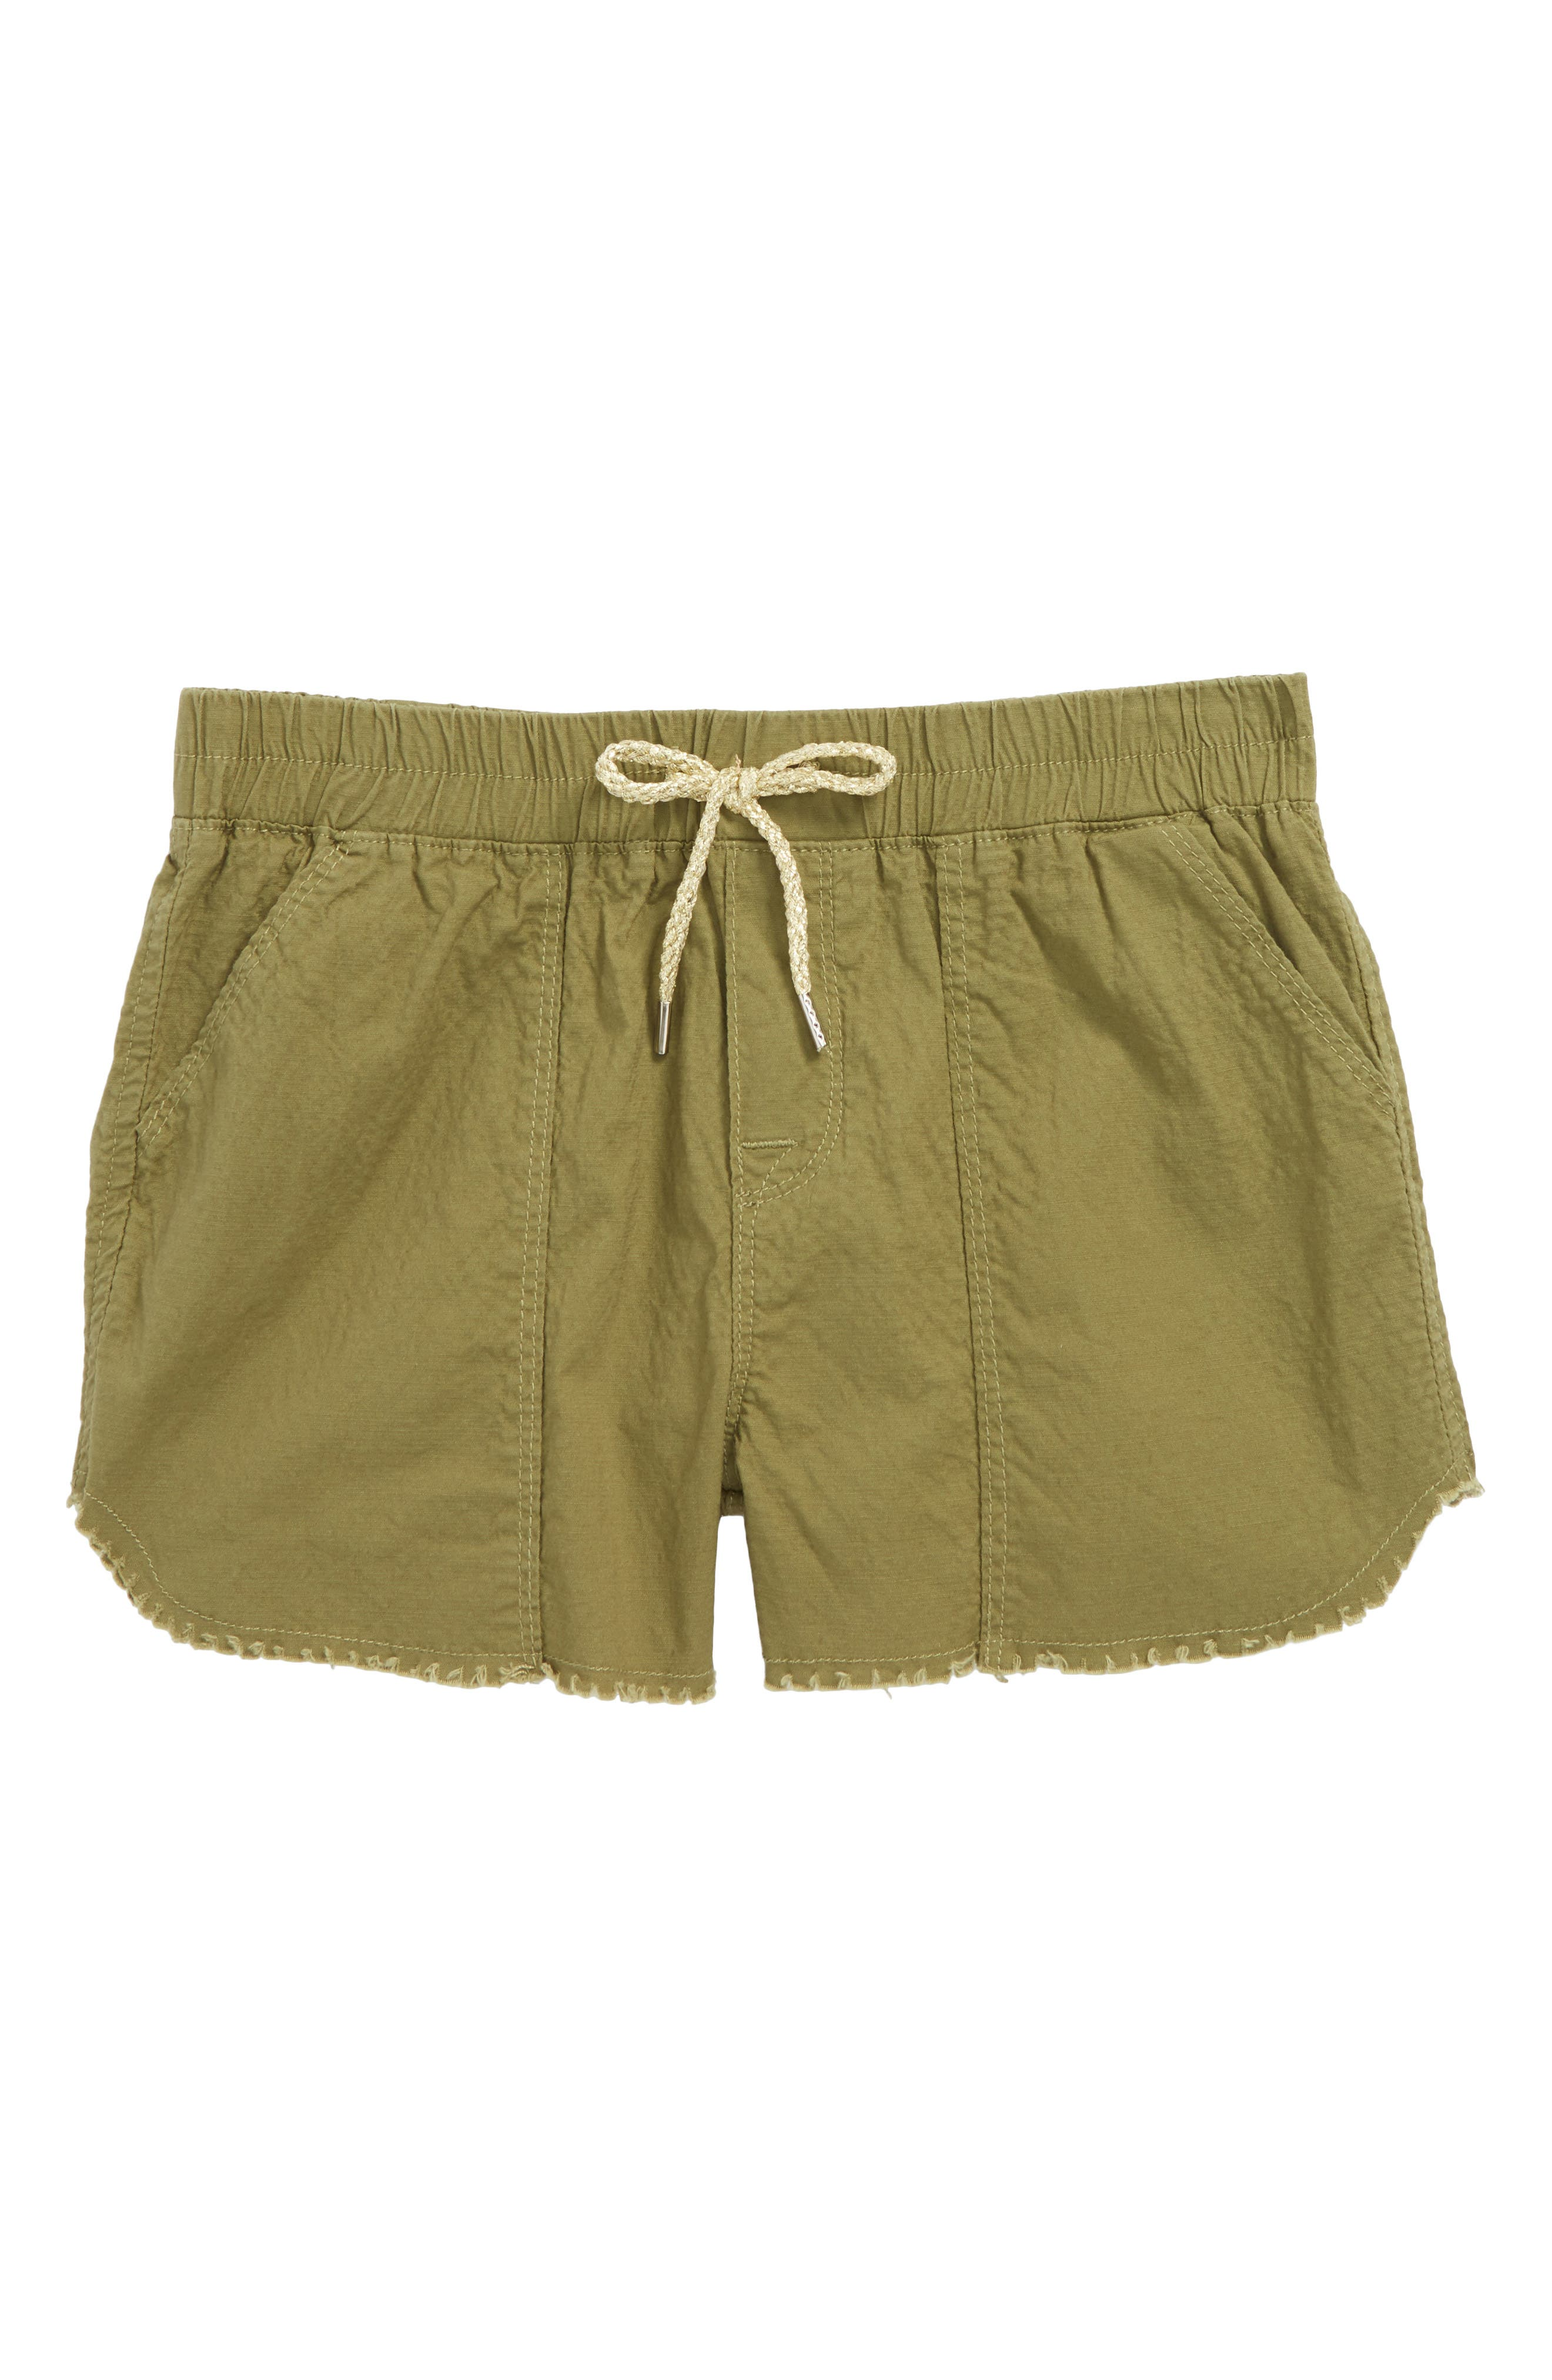 Surplus Chambray Shorts,                         Main,                         color, 300